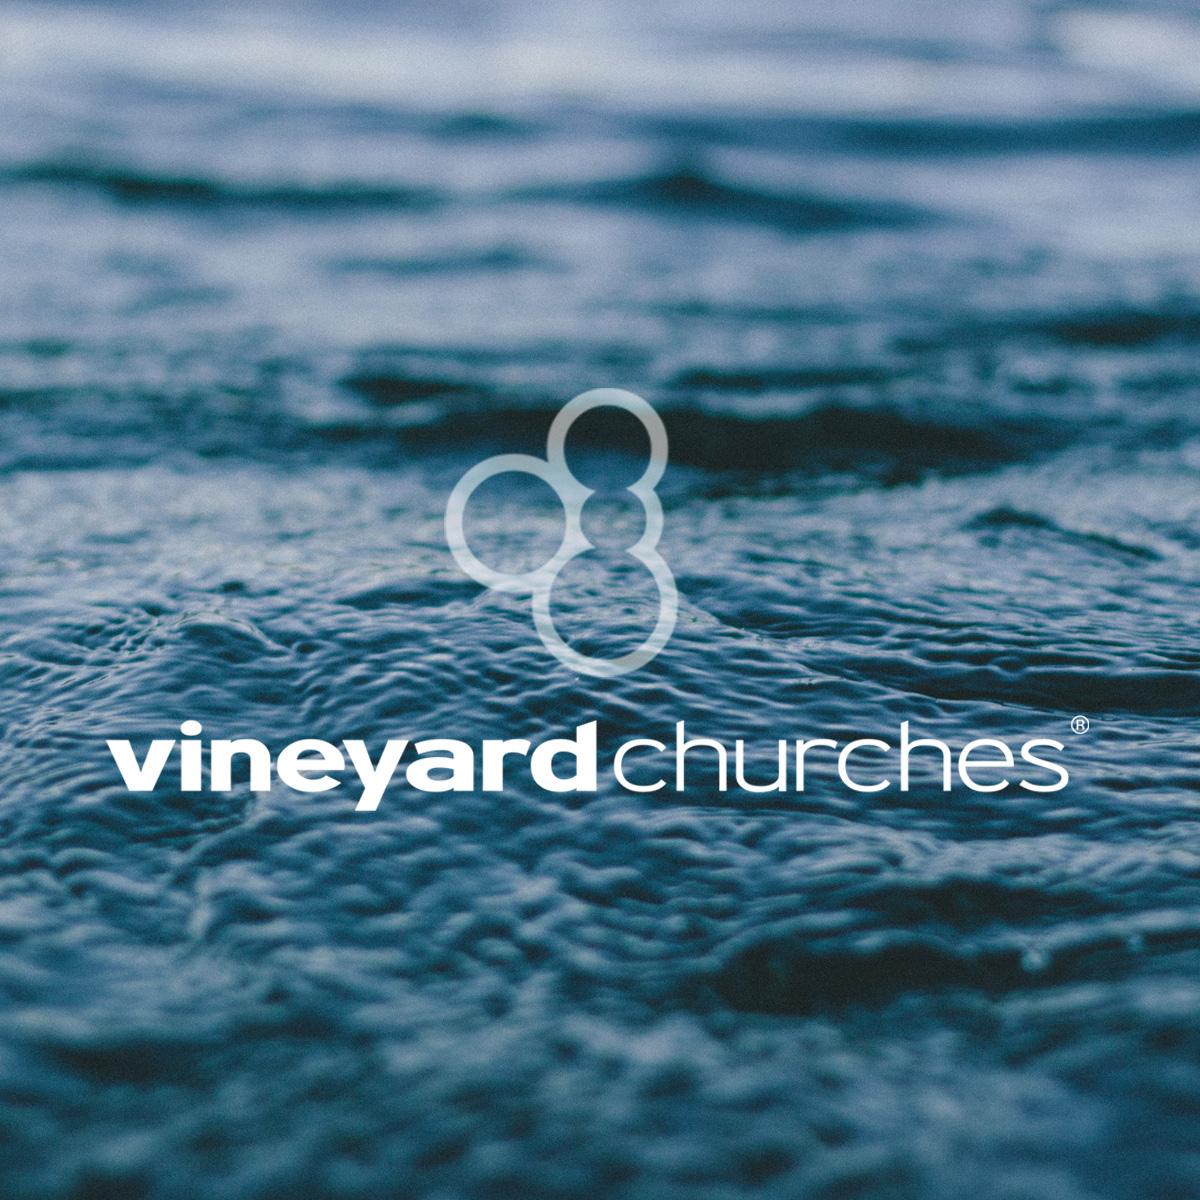 vineyard, church, st albans